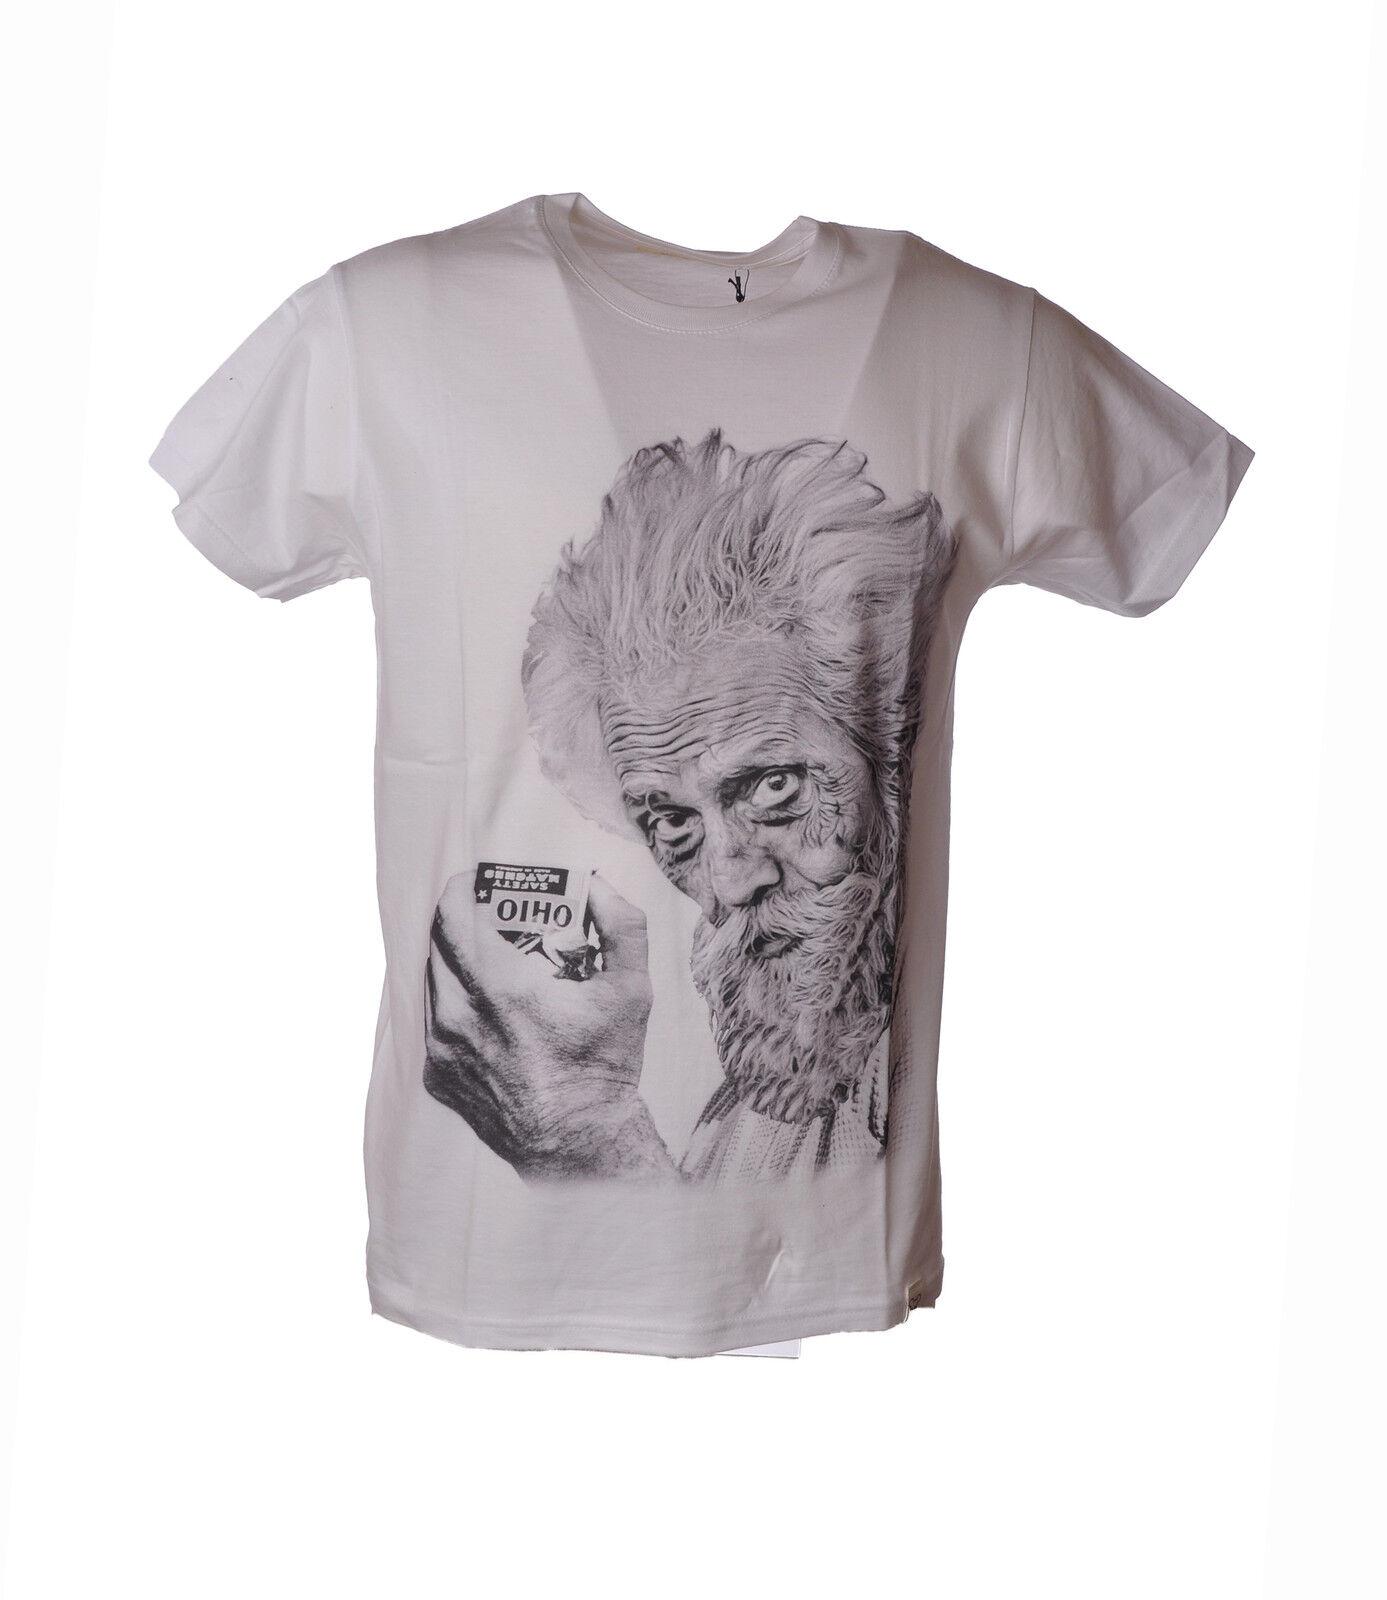 Obvious Basic - Topwear-T-shirts - Man - Weiß - 3569222G184105